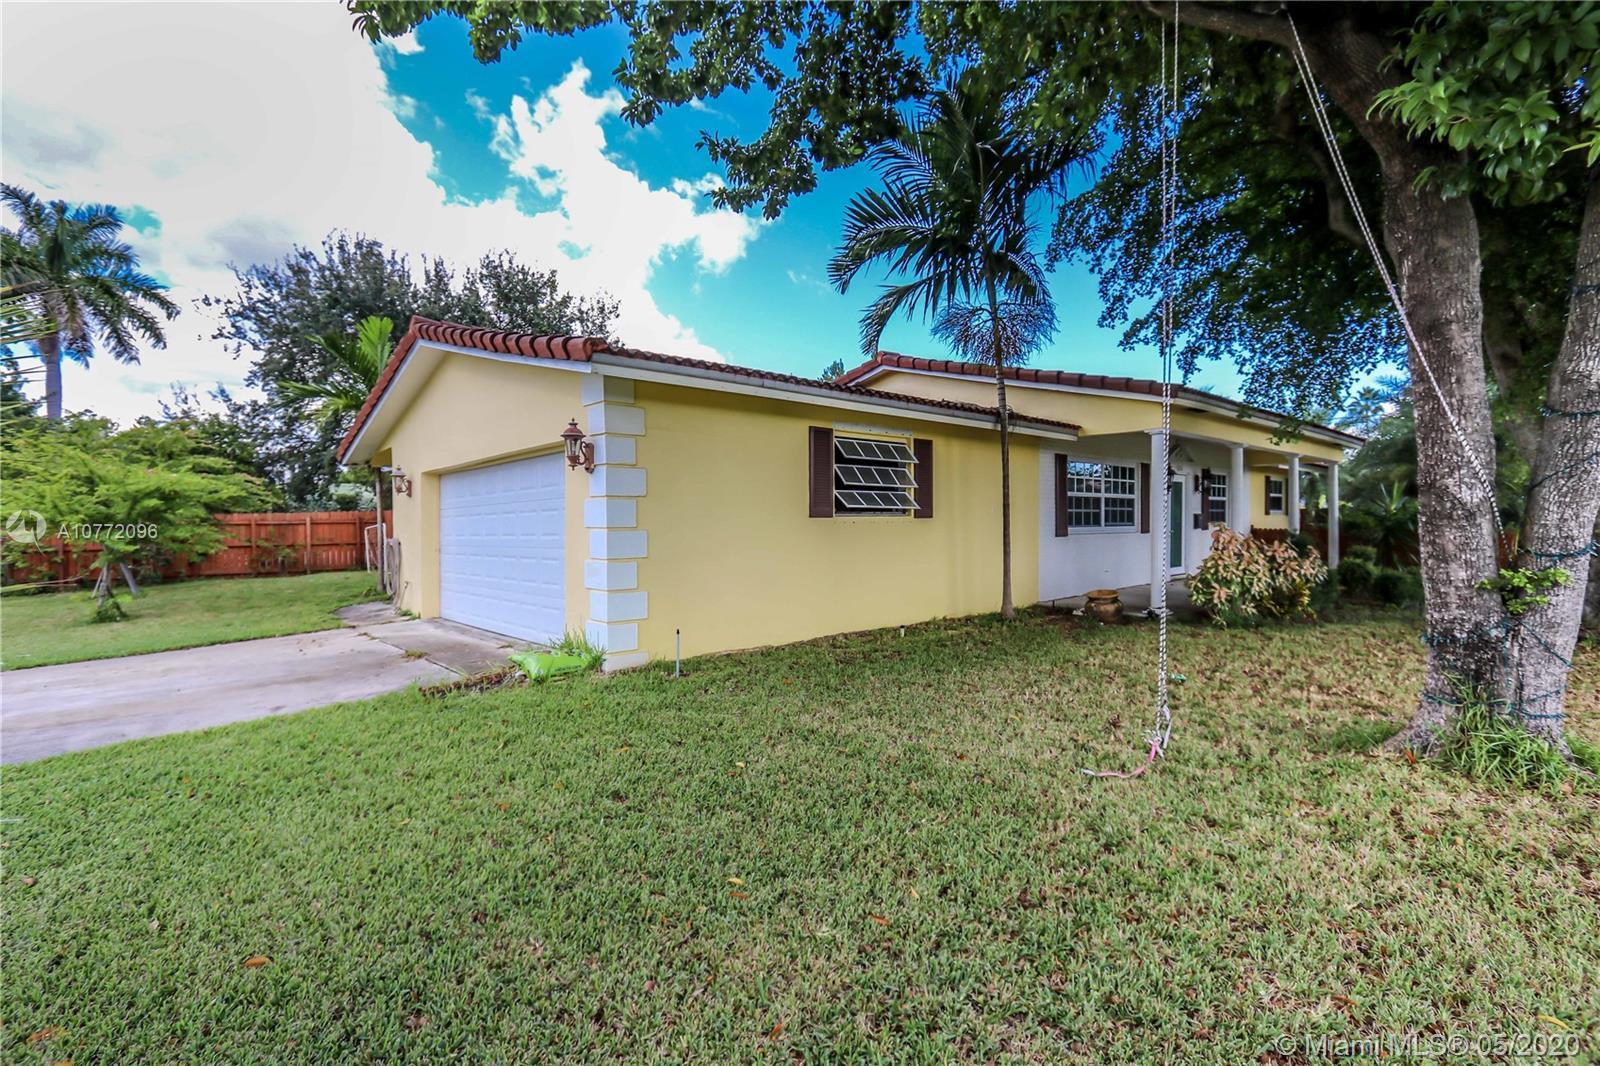 525 NE 3rd St  For Sale A10772096, FL